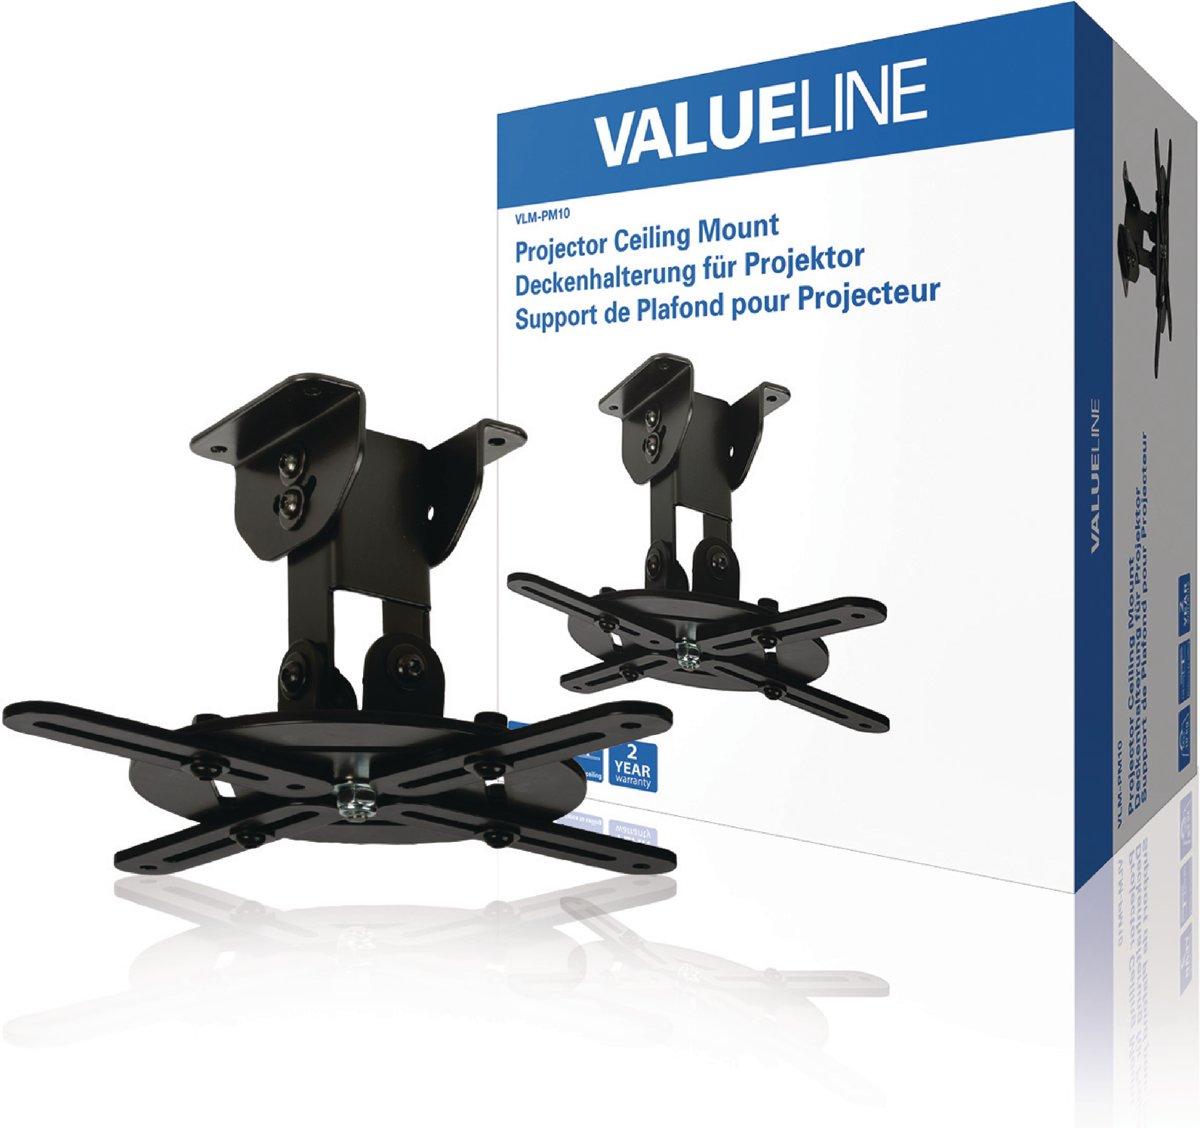 Valueline VLM-PM10 Projector Plafondbeugel Draai- En Kantelbaar 10 Kg Zwart kopen